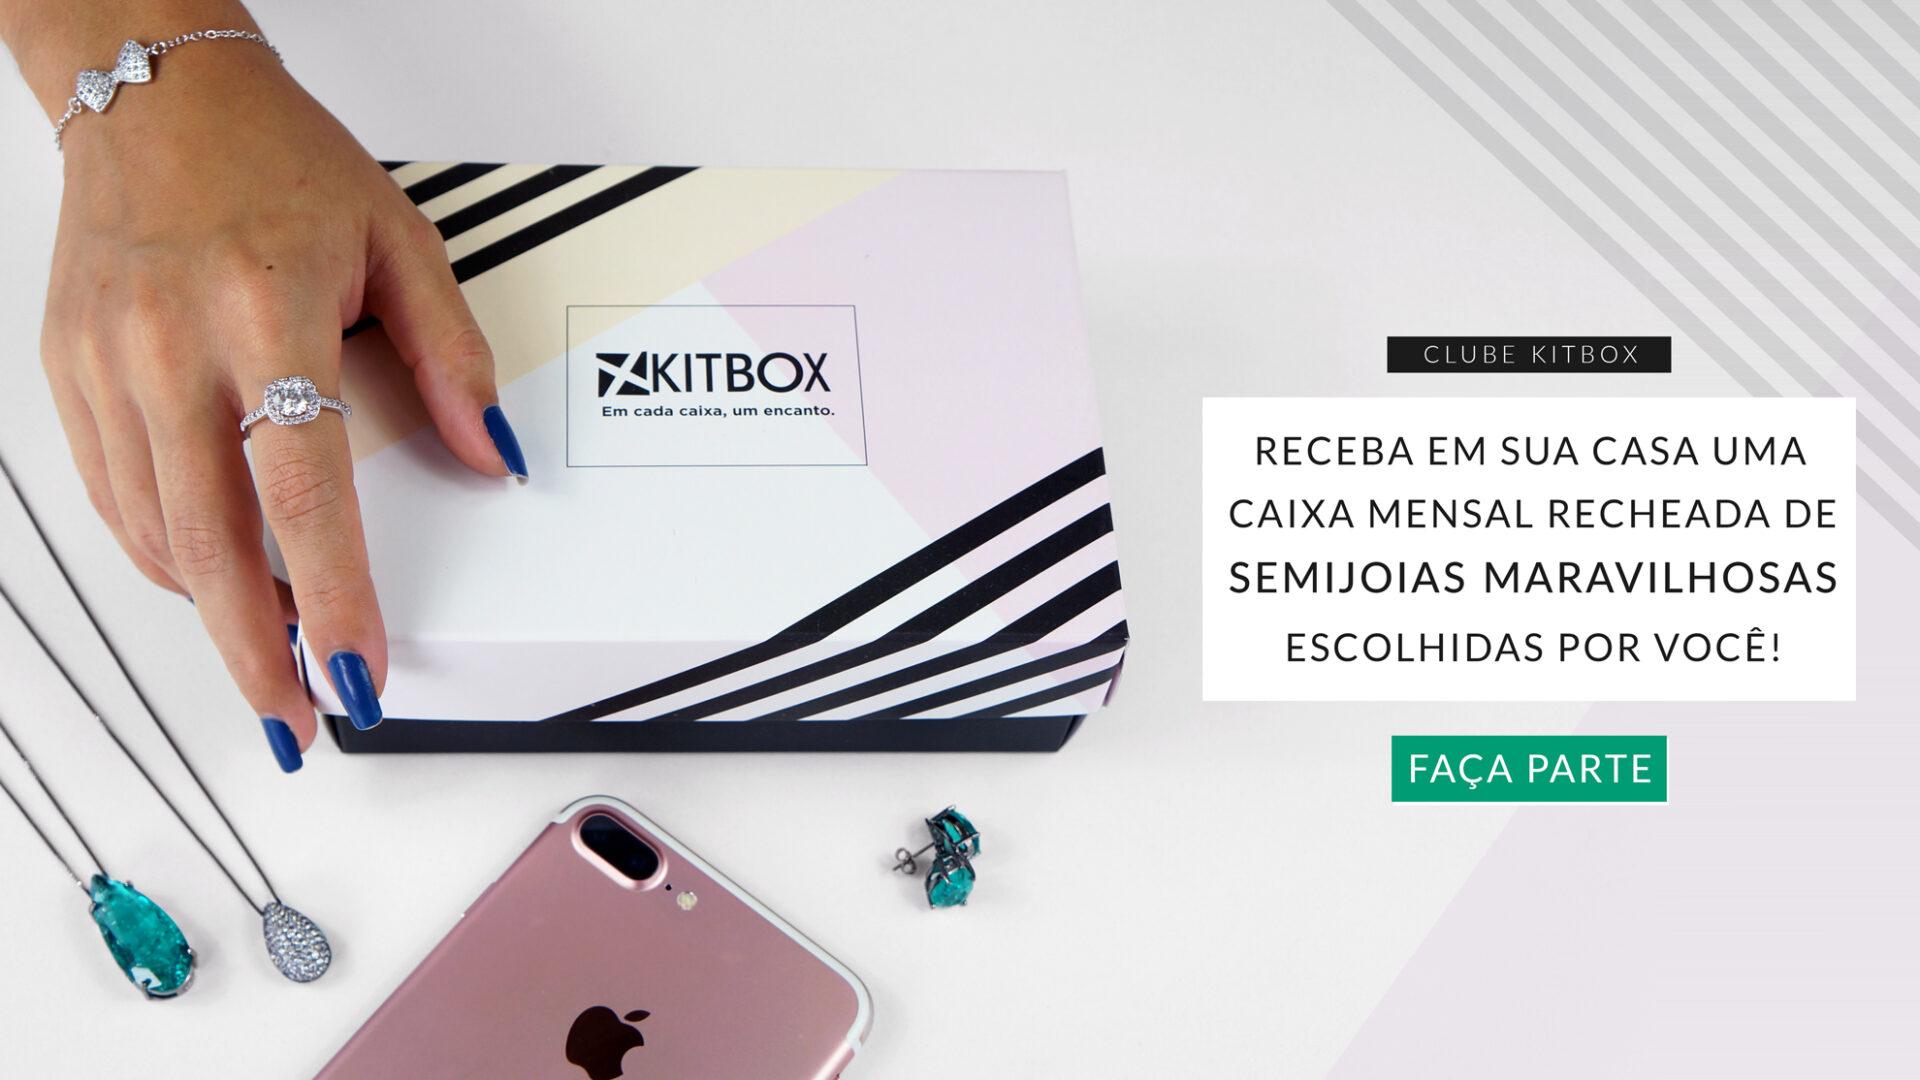 Semi joias Kitbox Janeiro 2019